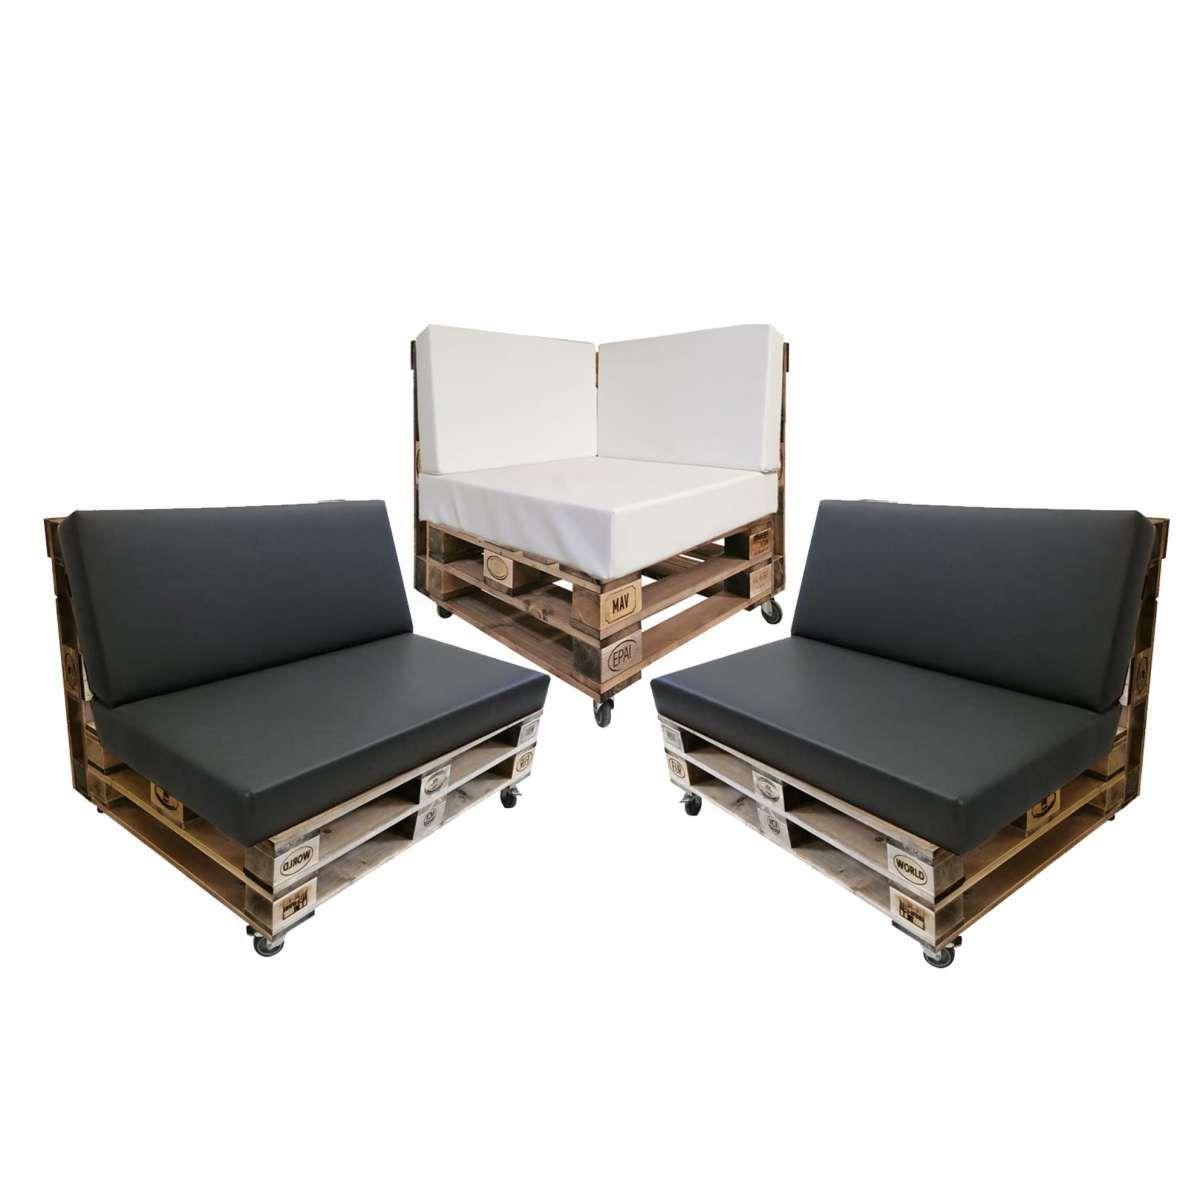 Der Online Shop Fur Hochwertige Palettenmobel Aus Professioneller Fertigung Vintage Retro Mobel Altholz Mobe Outdoor Furniture Pallet Furniture Outdoor Bed